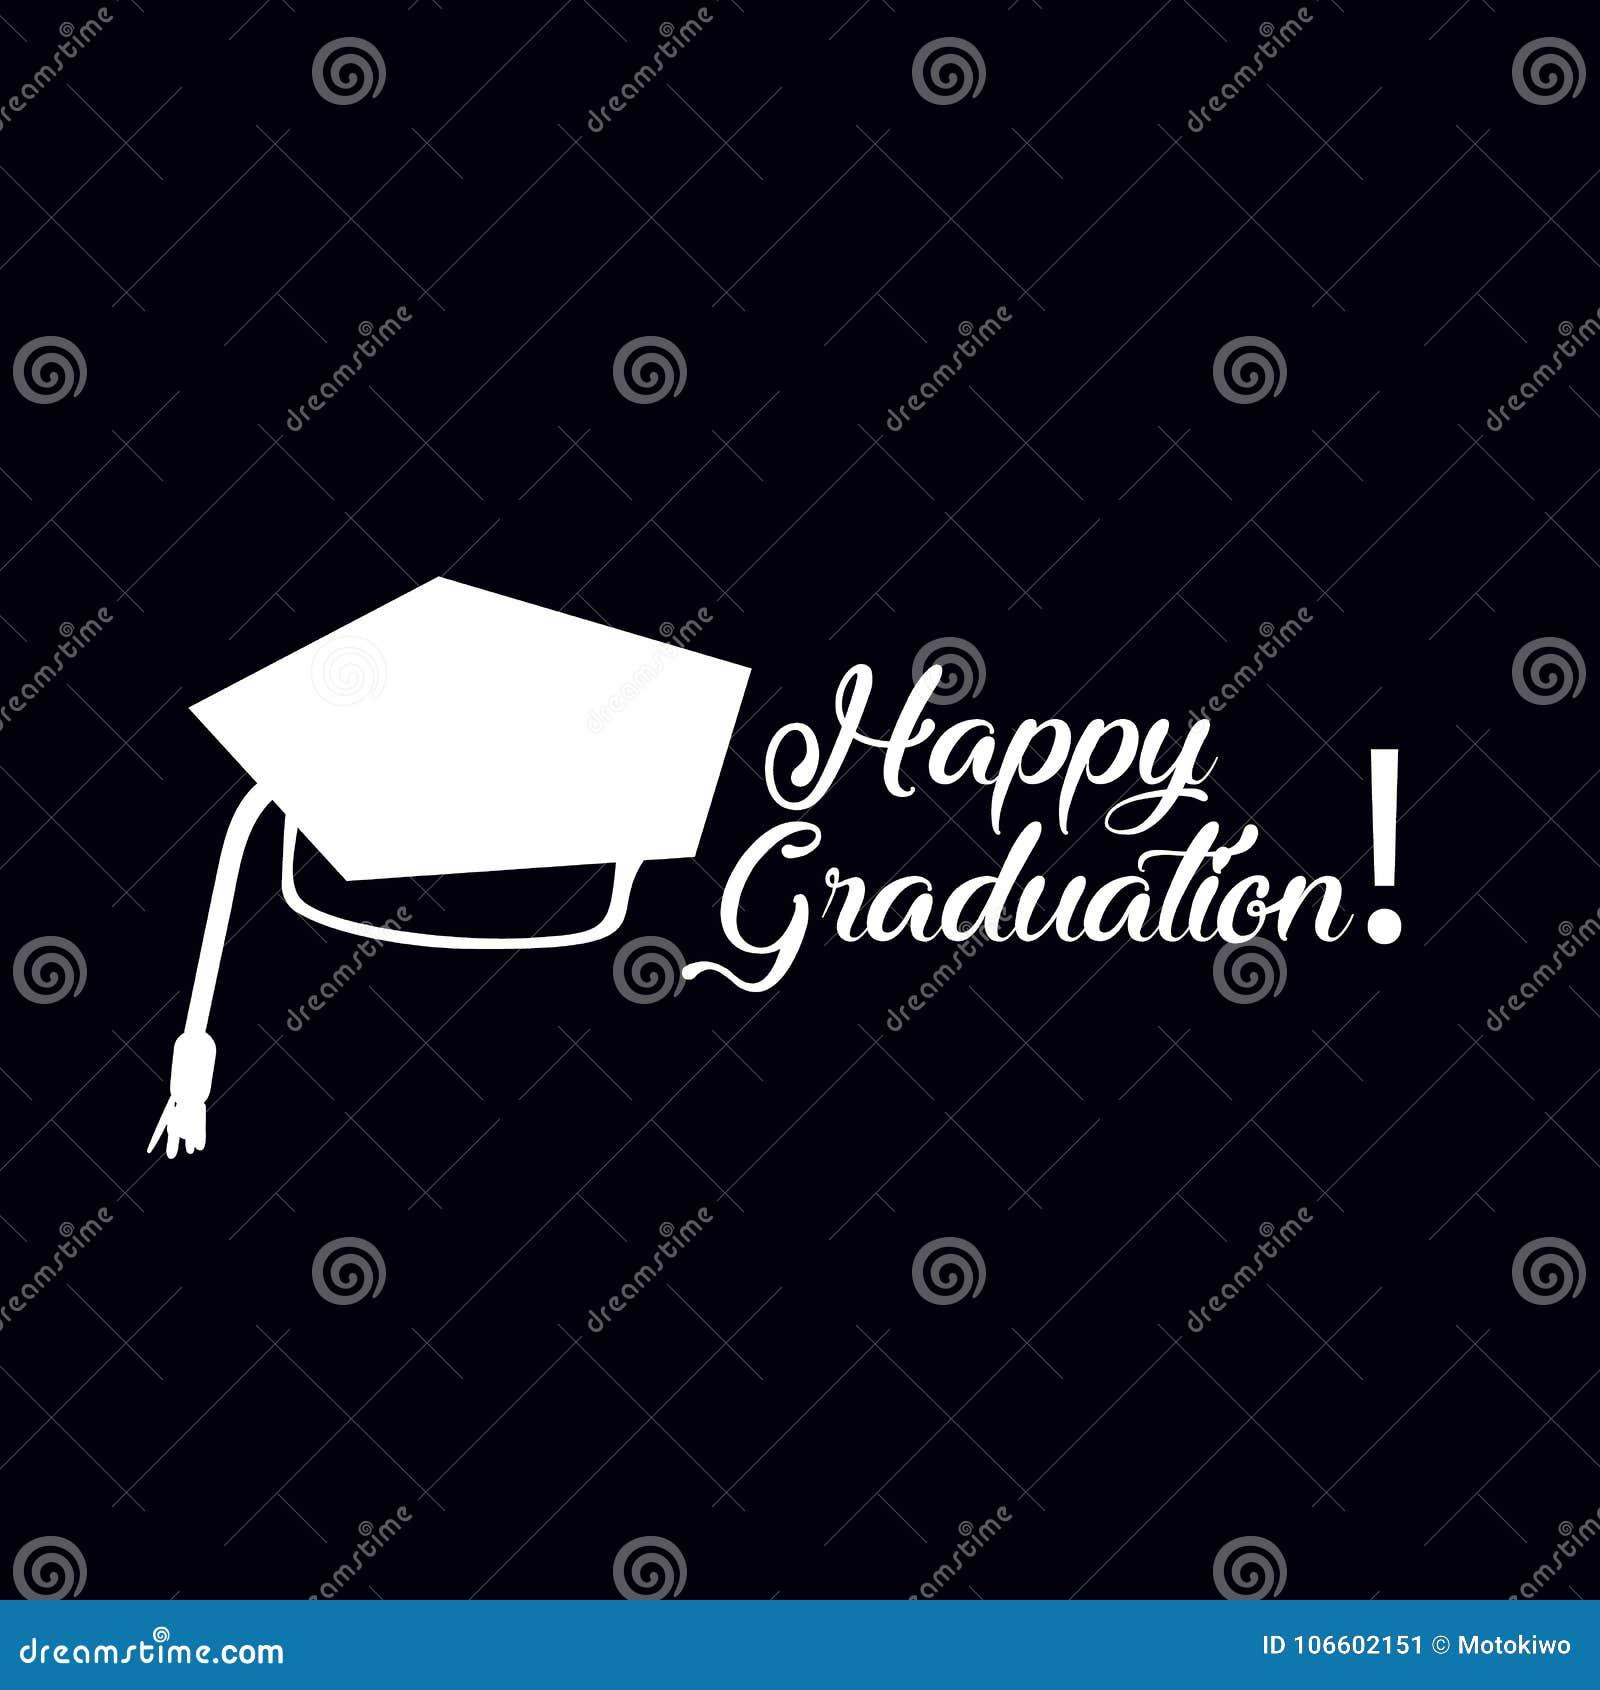 Happy Graduation Greeting Card Design Stock Illustration